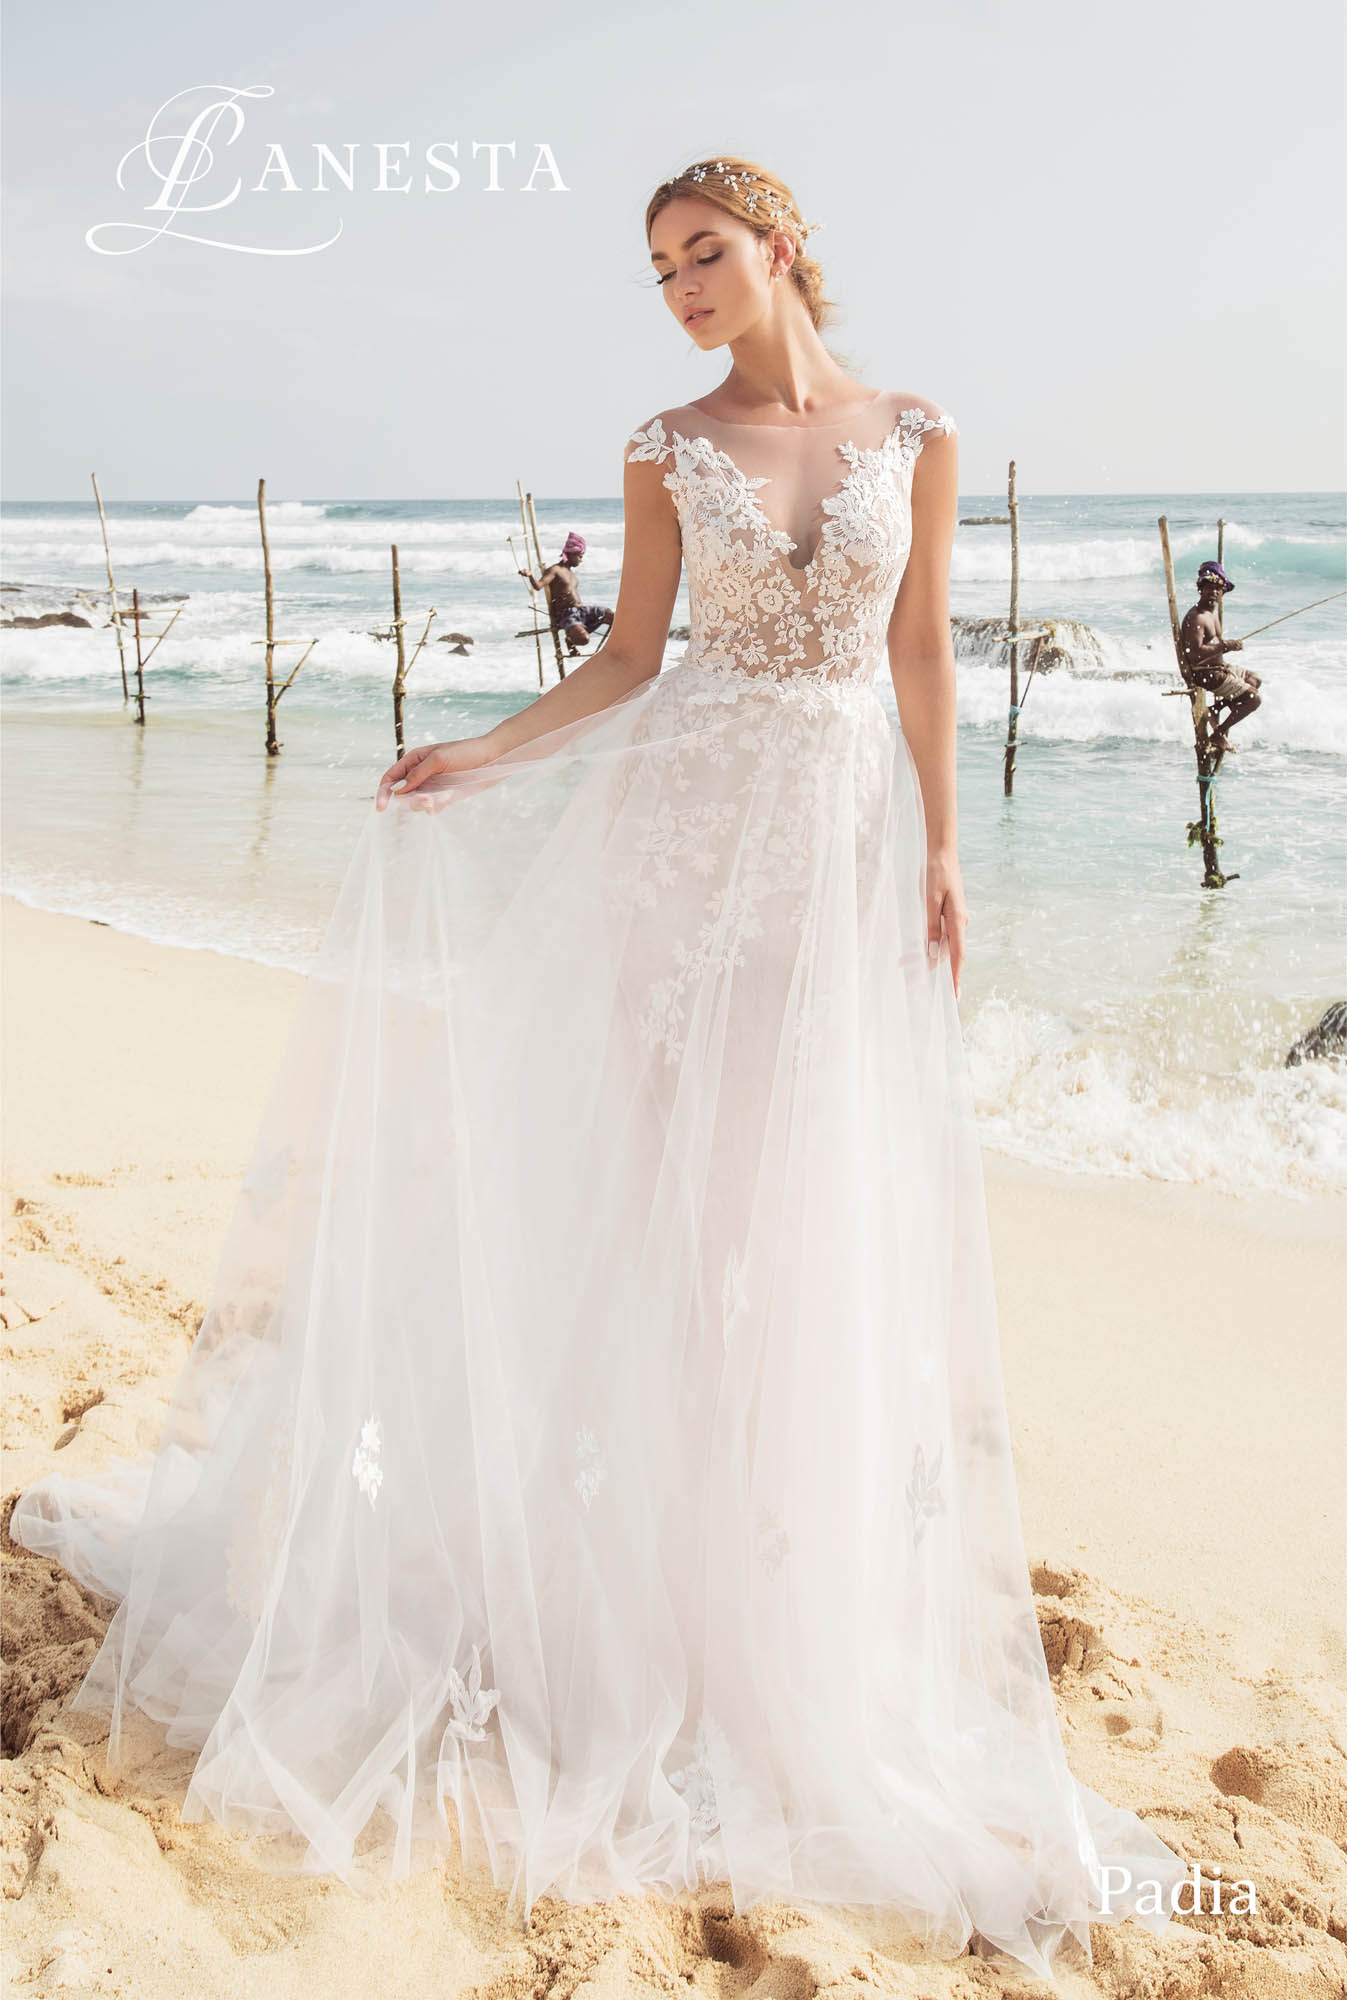 Cвадебное платье Padia